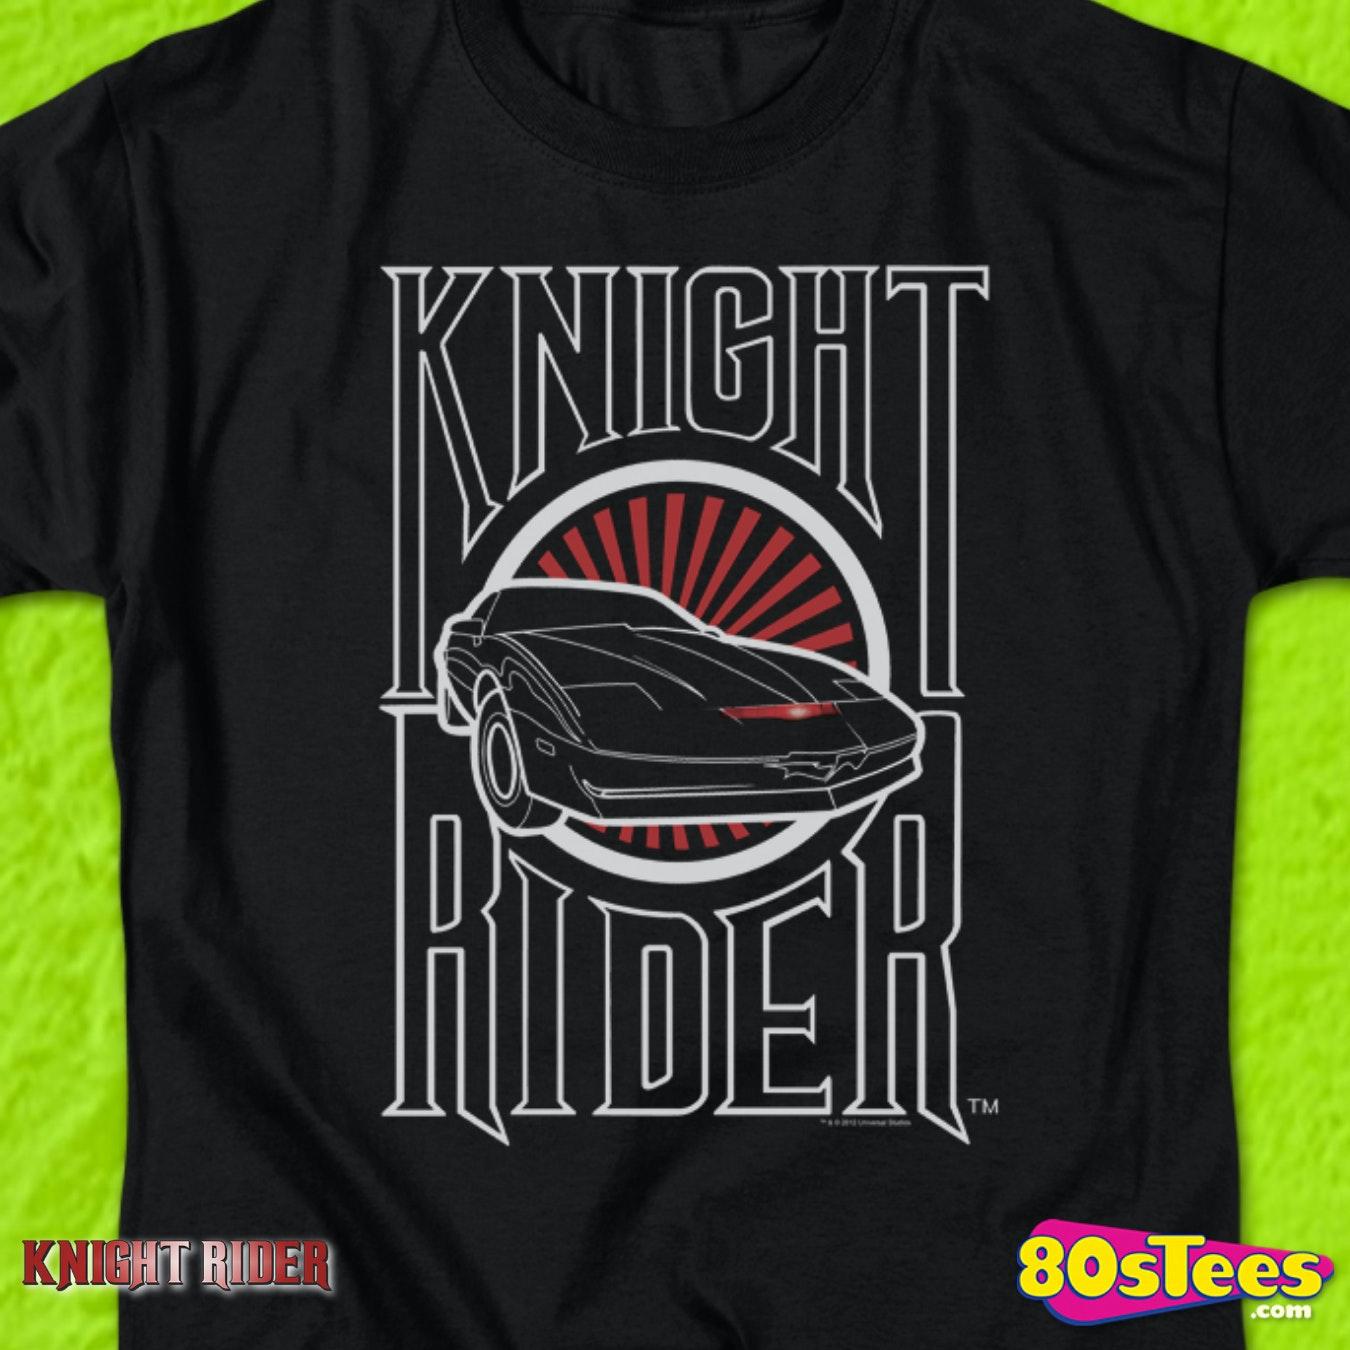 knight industries Knight-rider 80s TV show T-shirt